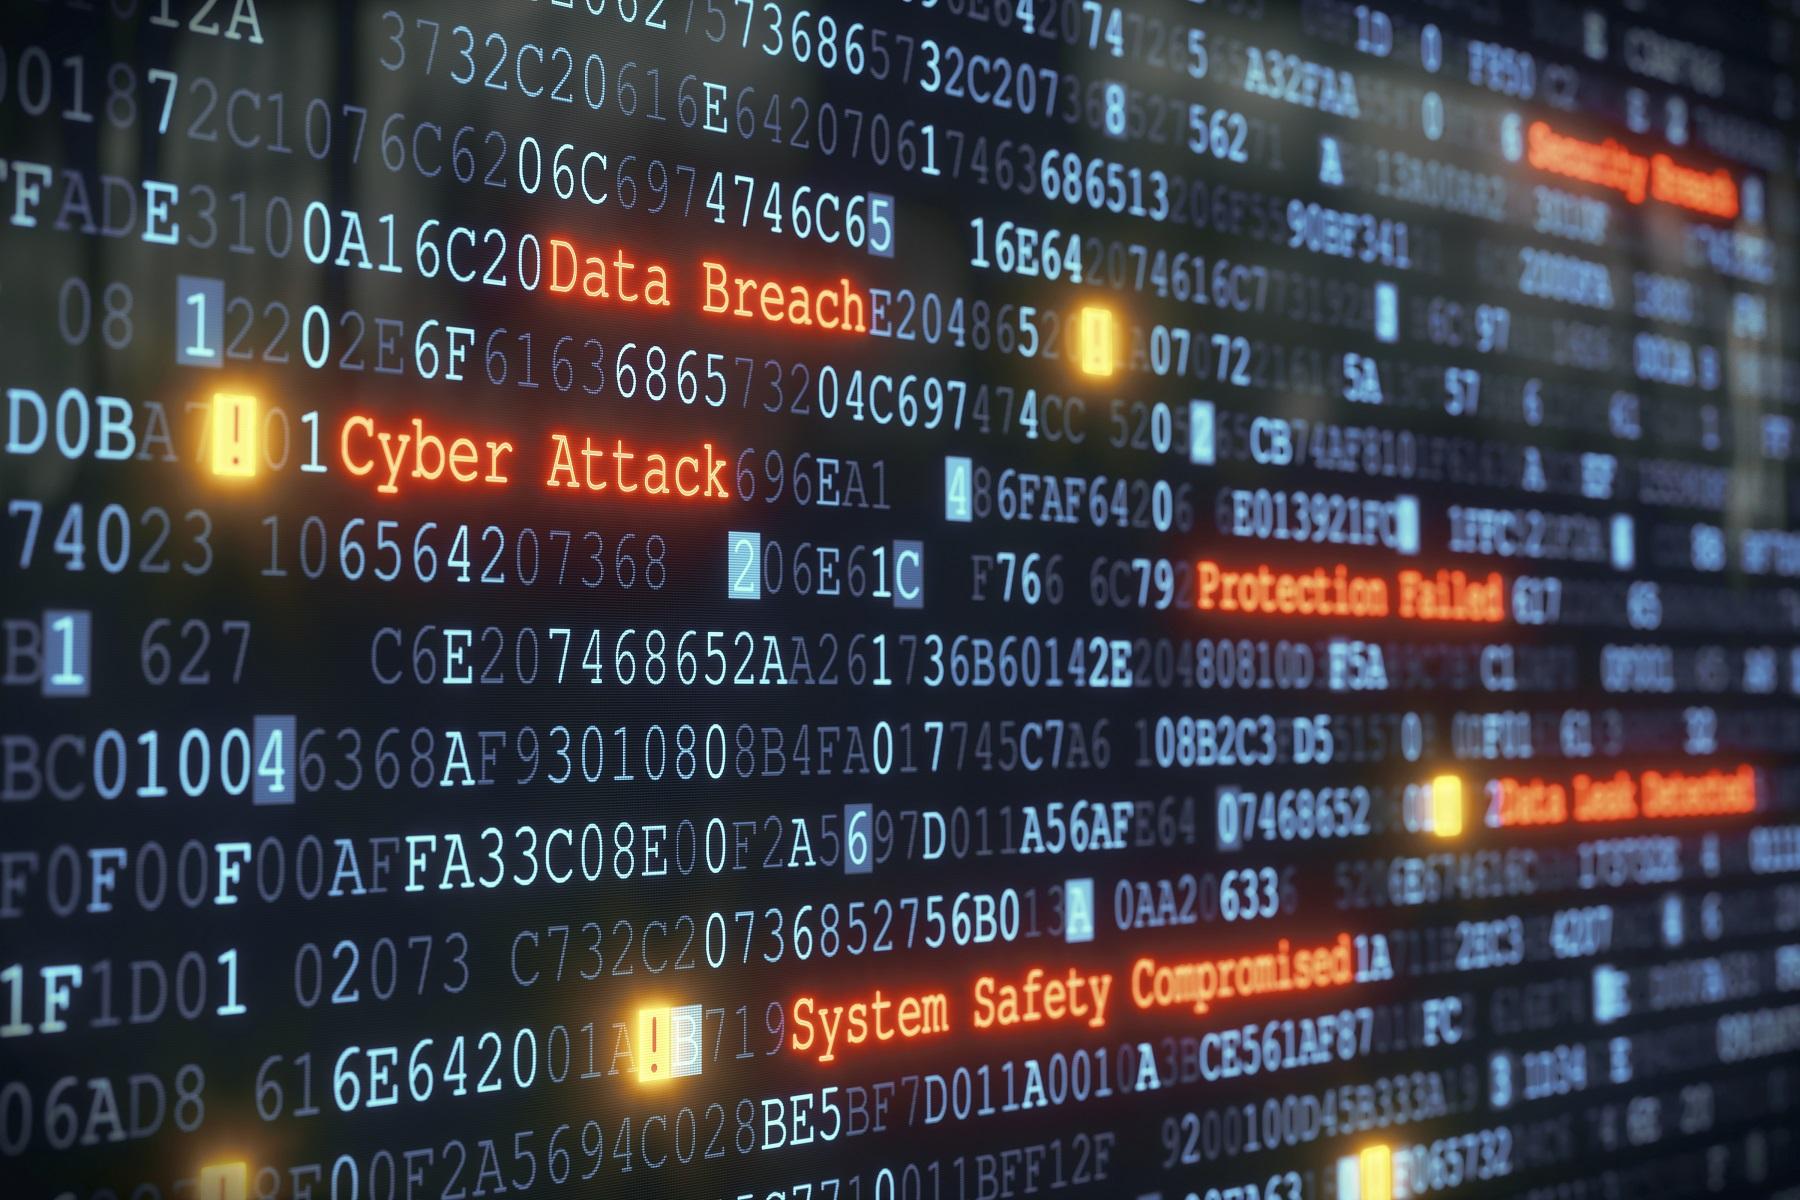 Cyber-Attack-A01-000068635057_XXXLarge-1.jpg